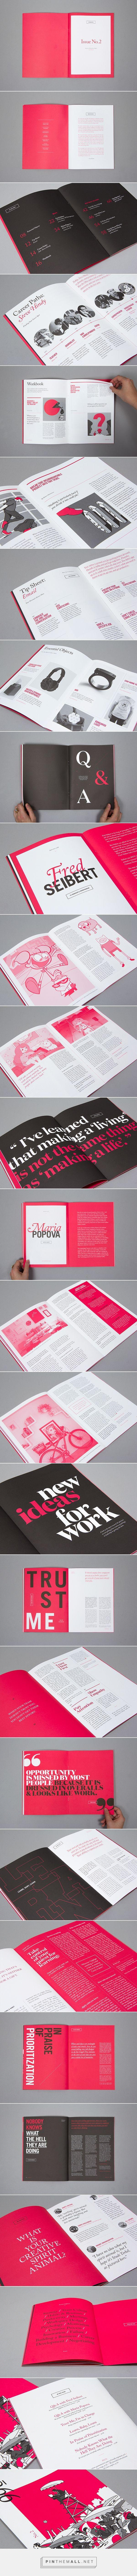 99U Quarterly Magazine :: Issue No.2 on Behance - created via https://pinthemall.net